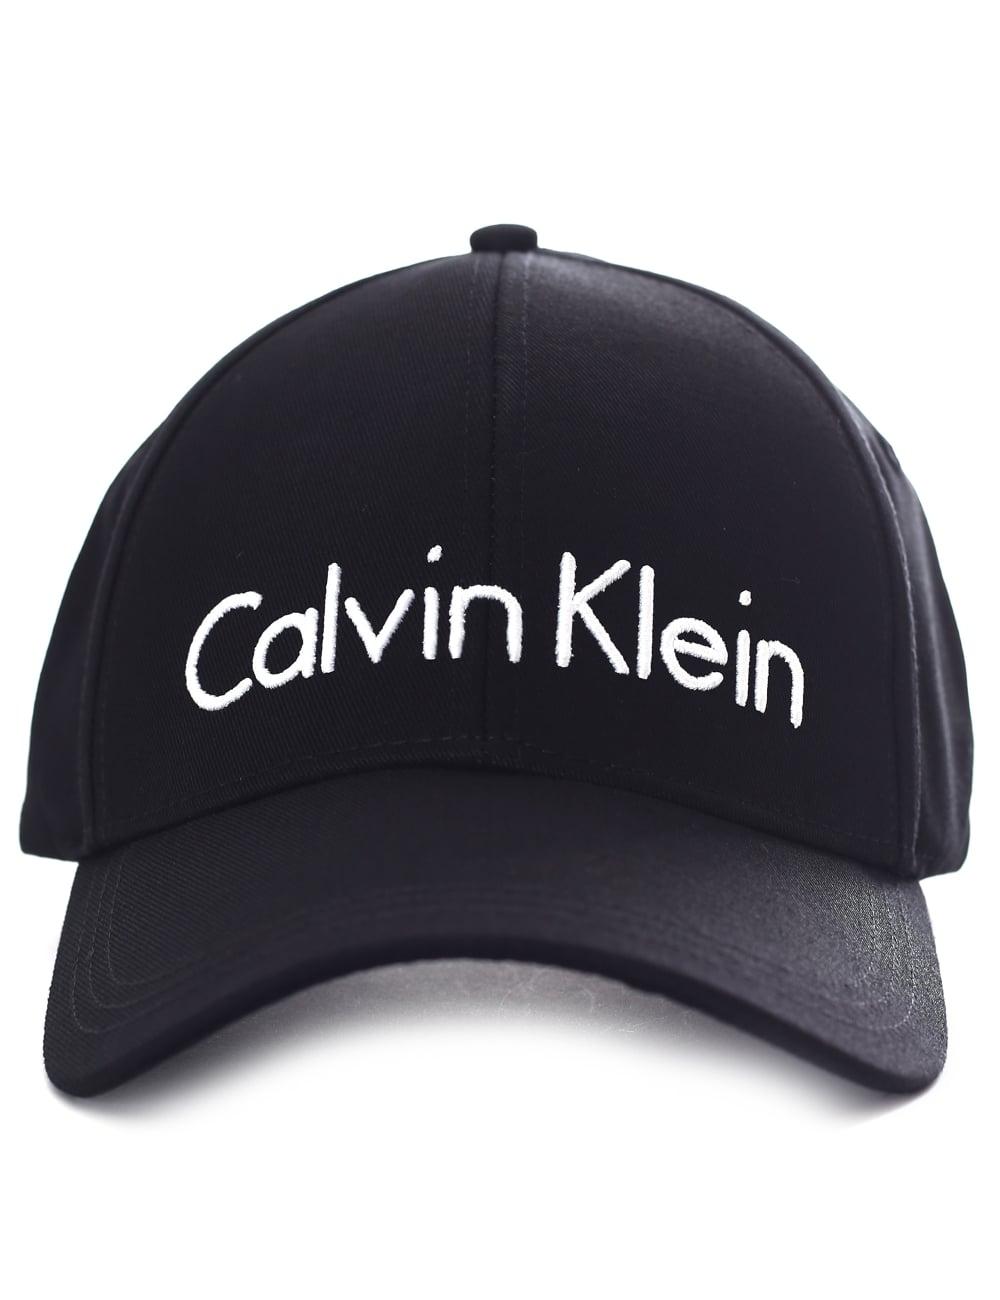 Calvin Klein Women s Logo Baseball Cap 3c8ae96eaf5